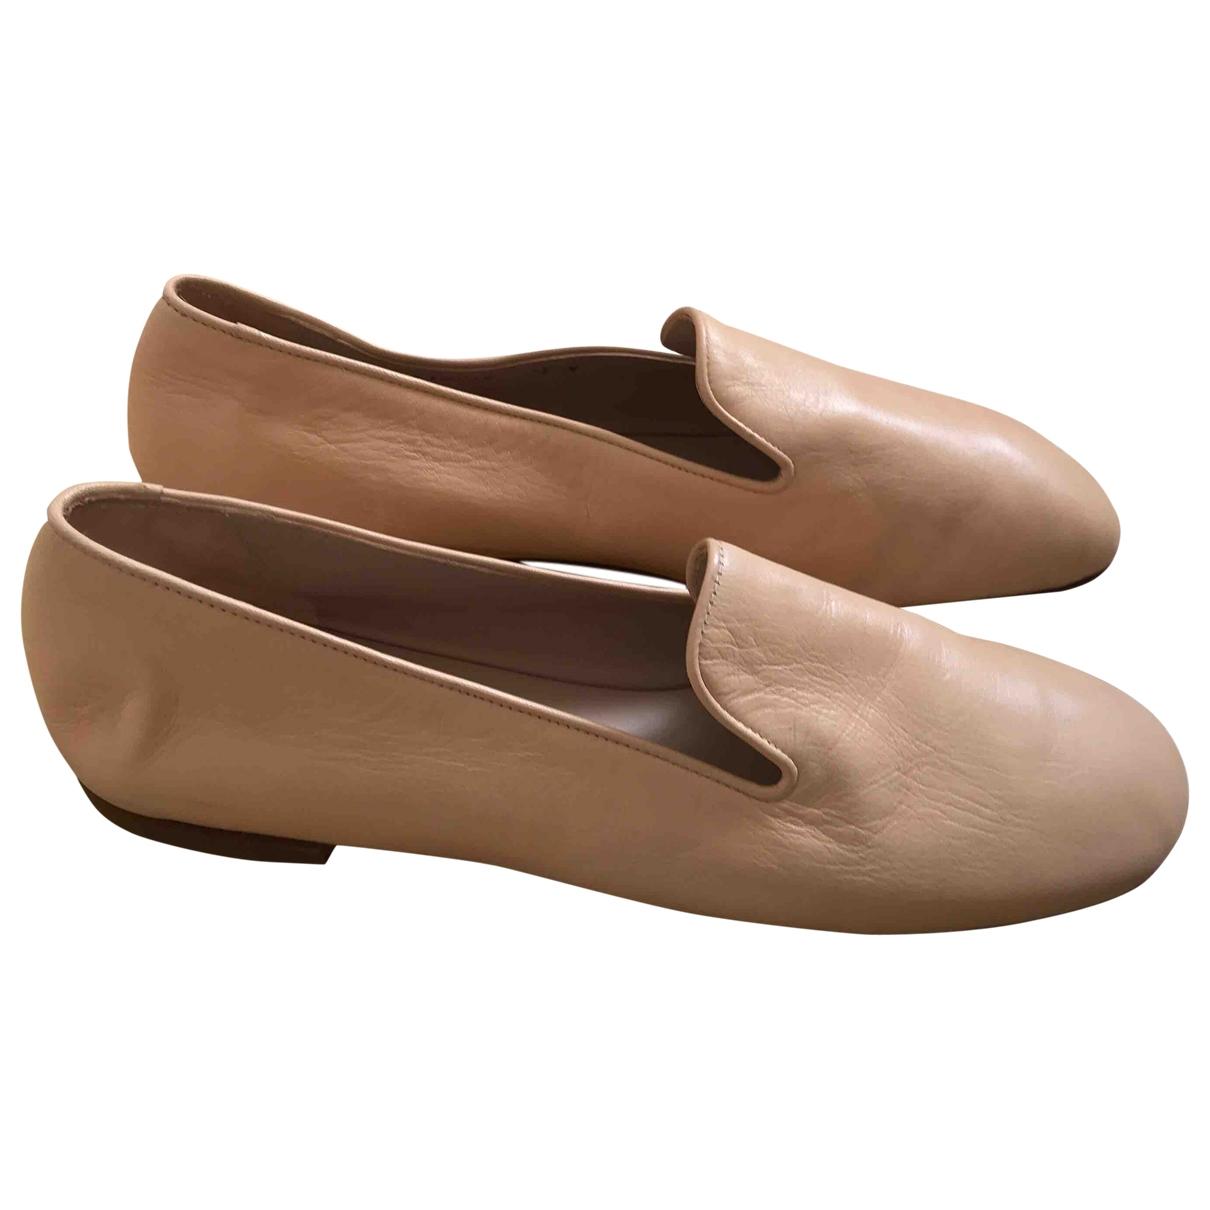 Stuart Weitzman \N Beige Leather Flats for Women 7.5 US